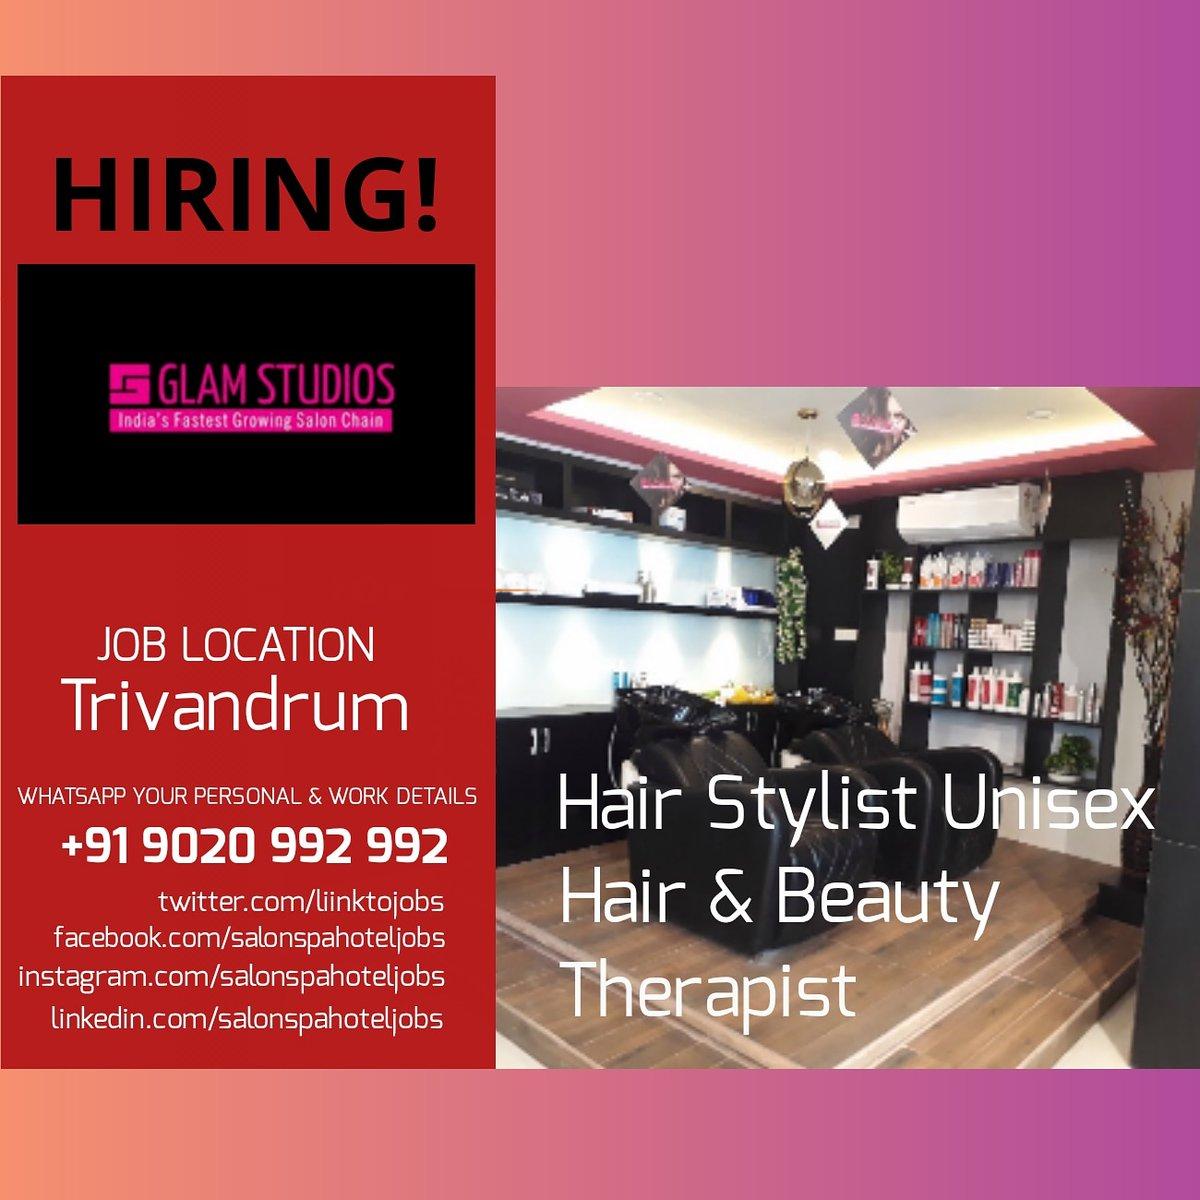 #salonspahoteljobs #salon #salonjobs #hairstylist #jobs #beautician #keralasalon #hairsalonjobs #salonlife #salonowner #salonnails #salonprofessional #spajobs #keralajobs #indiasalon  #indiasalonjobs #indianmakeupartist #hairstyle #salonjob #jobsearch #spasalon #spa #spajobpic.twitter.com/czCRYqrn8G